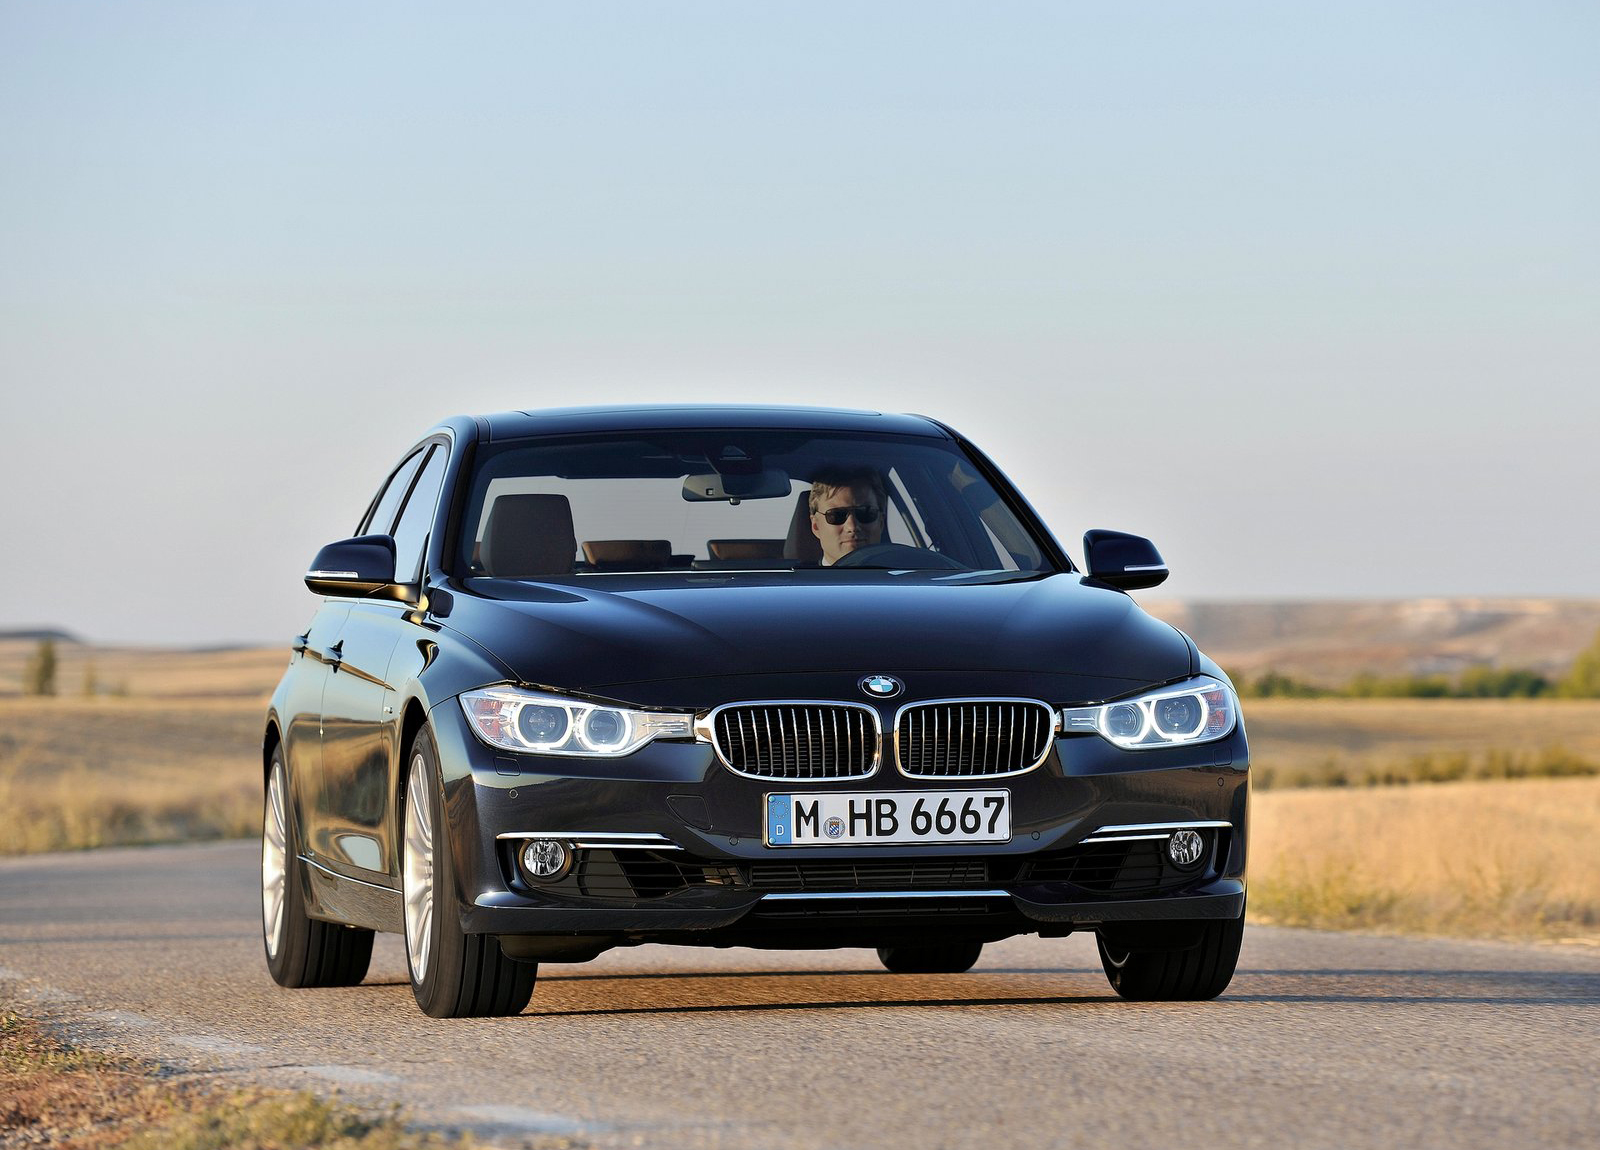 http://3.bp.blogspot.com/-jSJOsubGik0/UCp0csmVFQI/AAAAAAAAHFo/7o4jhn1sj8M/s1600/BMW-3-Series_2012_1600x1200_wallpaper_11.jpg